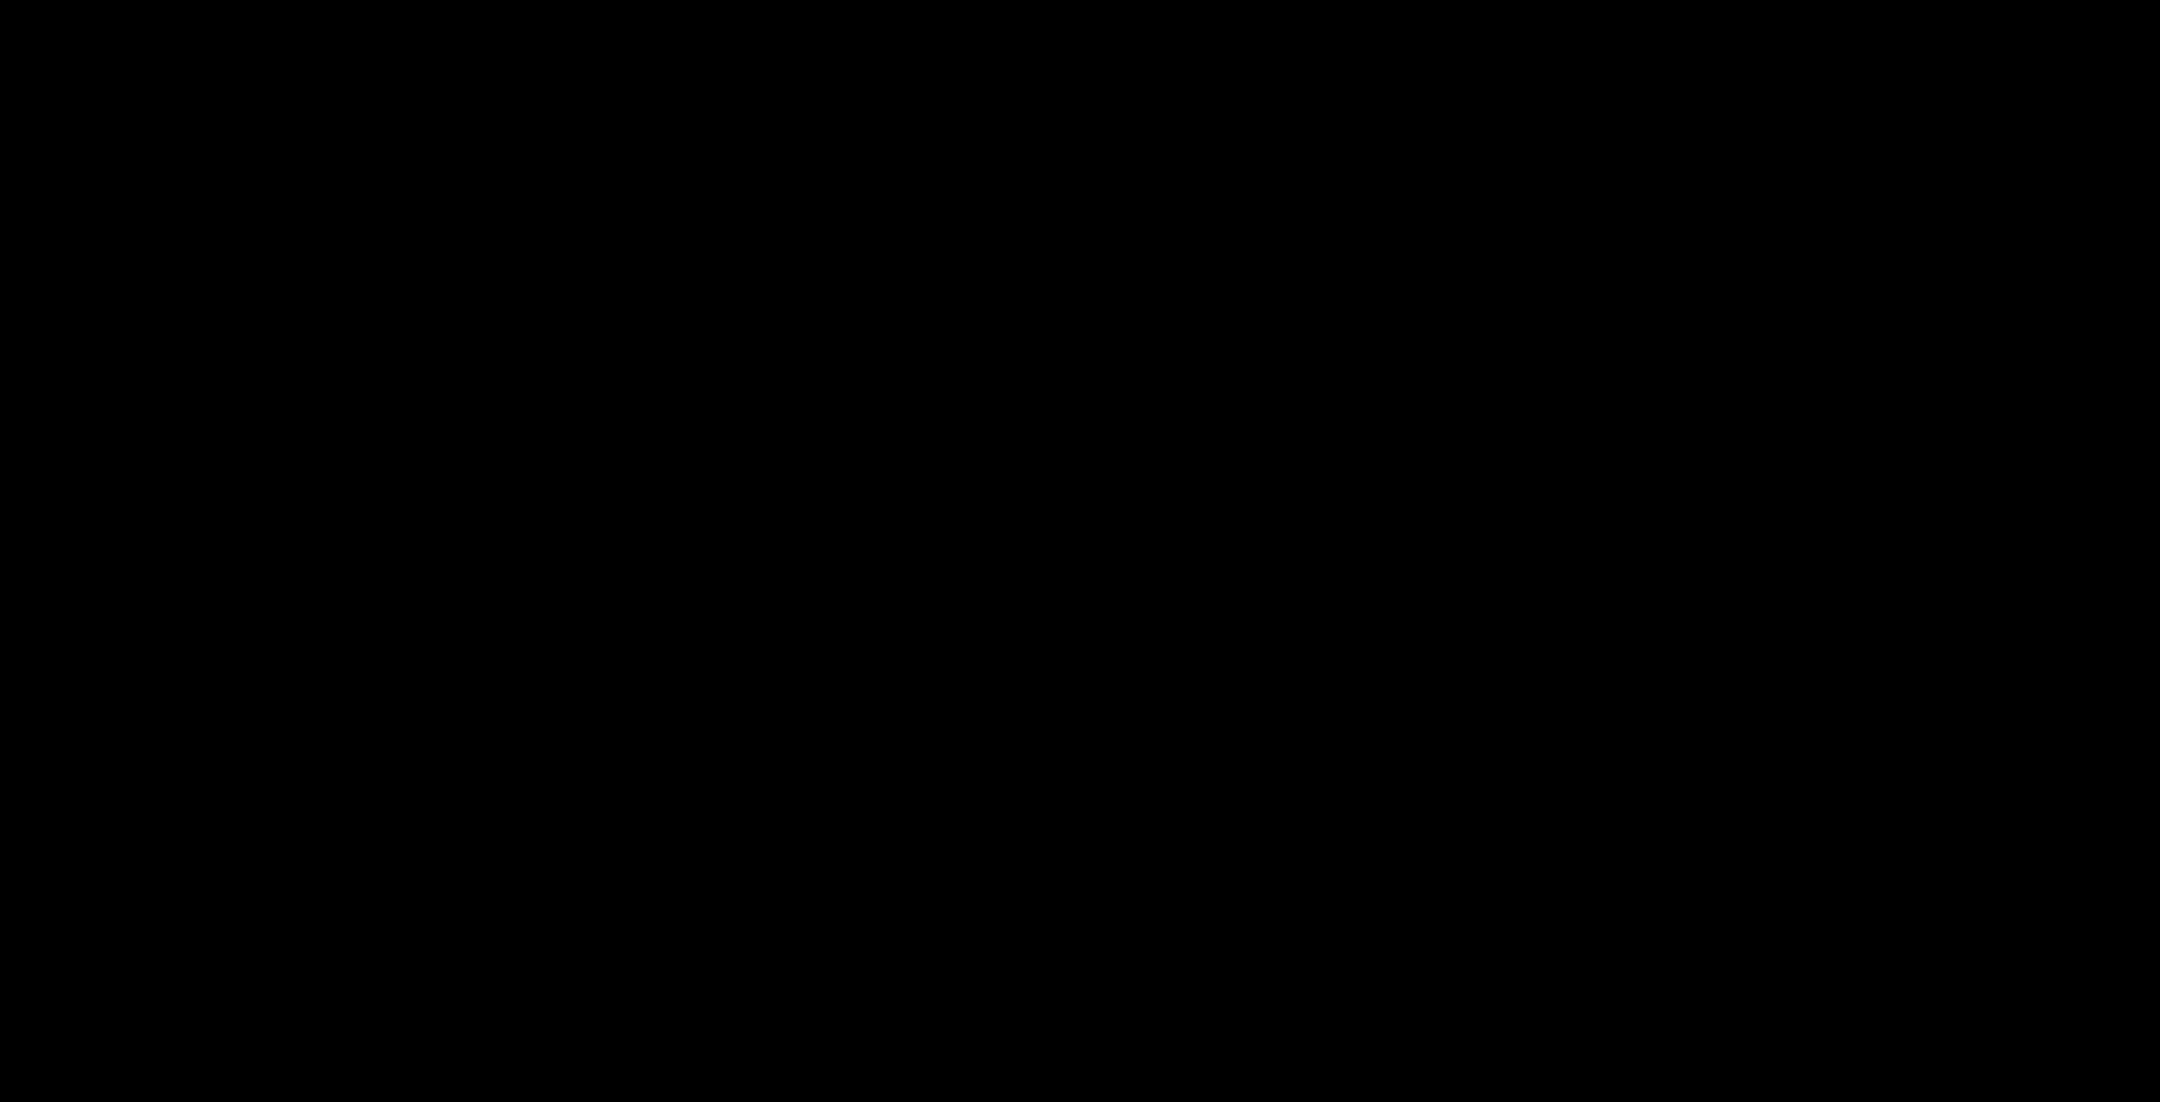 the beatles logo 1 - The Beatles Logo